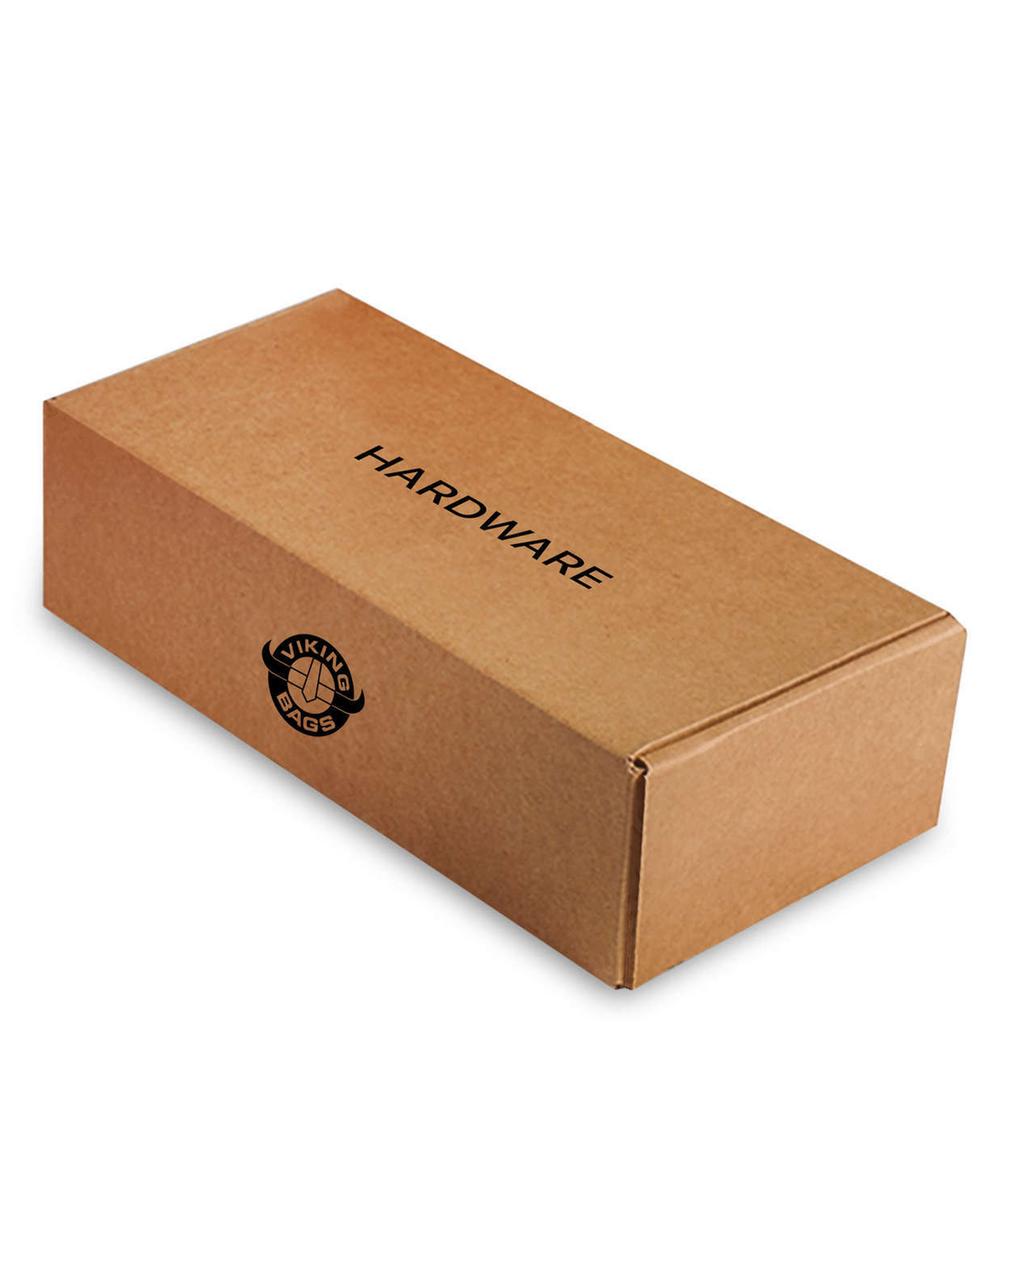 Viking Lamellar Matte Motorcycle Hard Saddlebags For Honda VTX 1800 F hardware Box